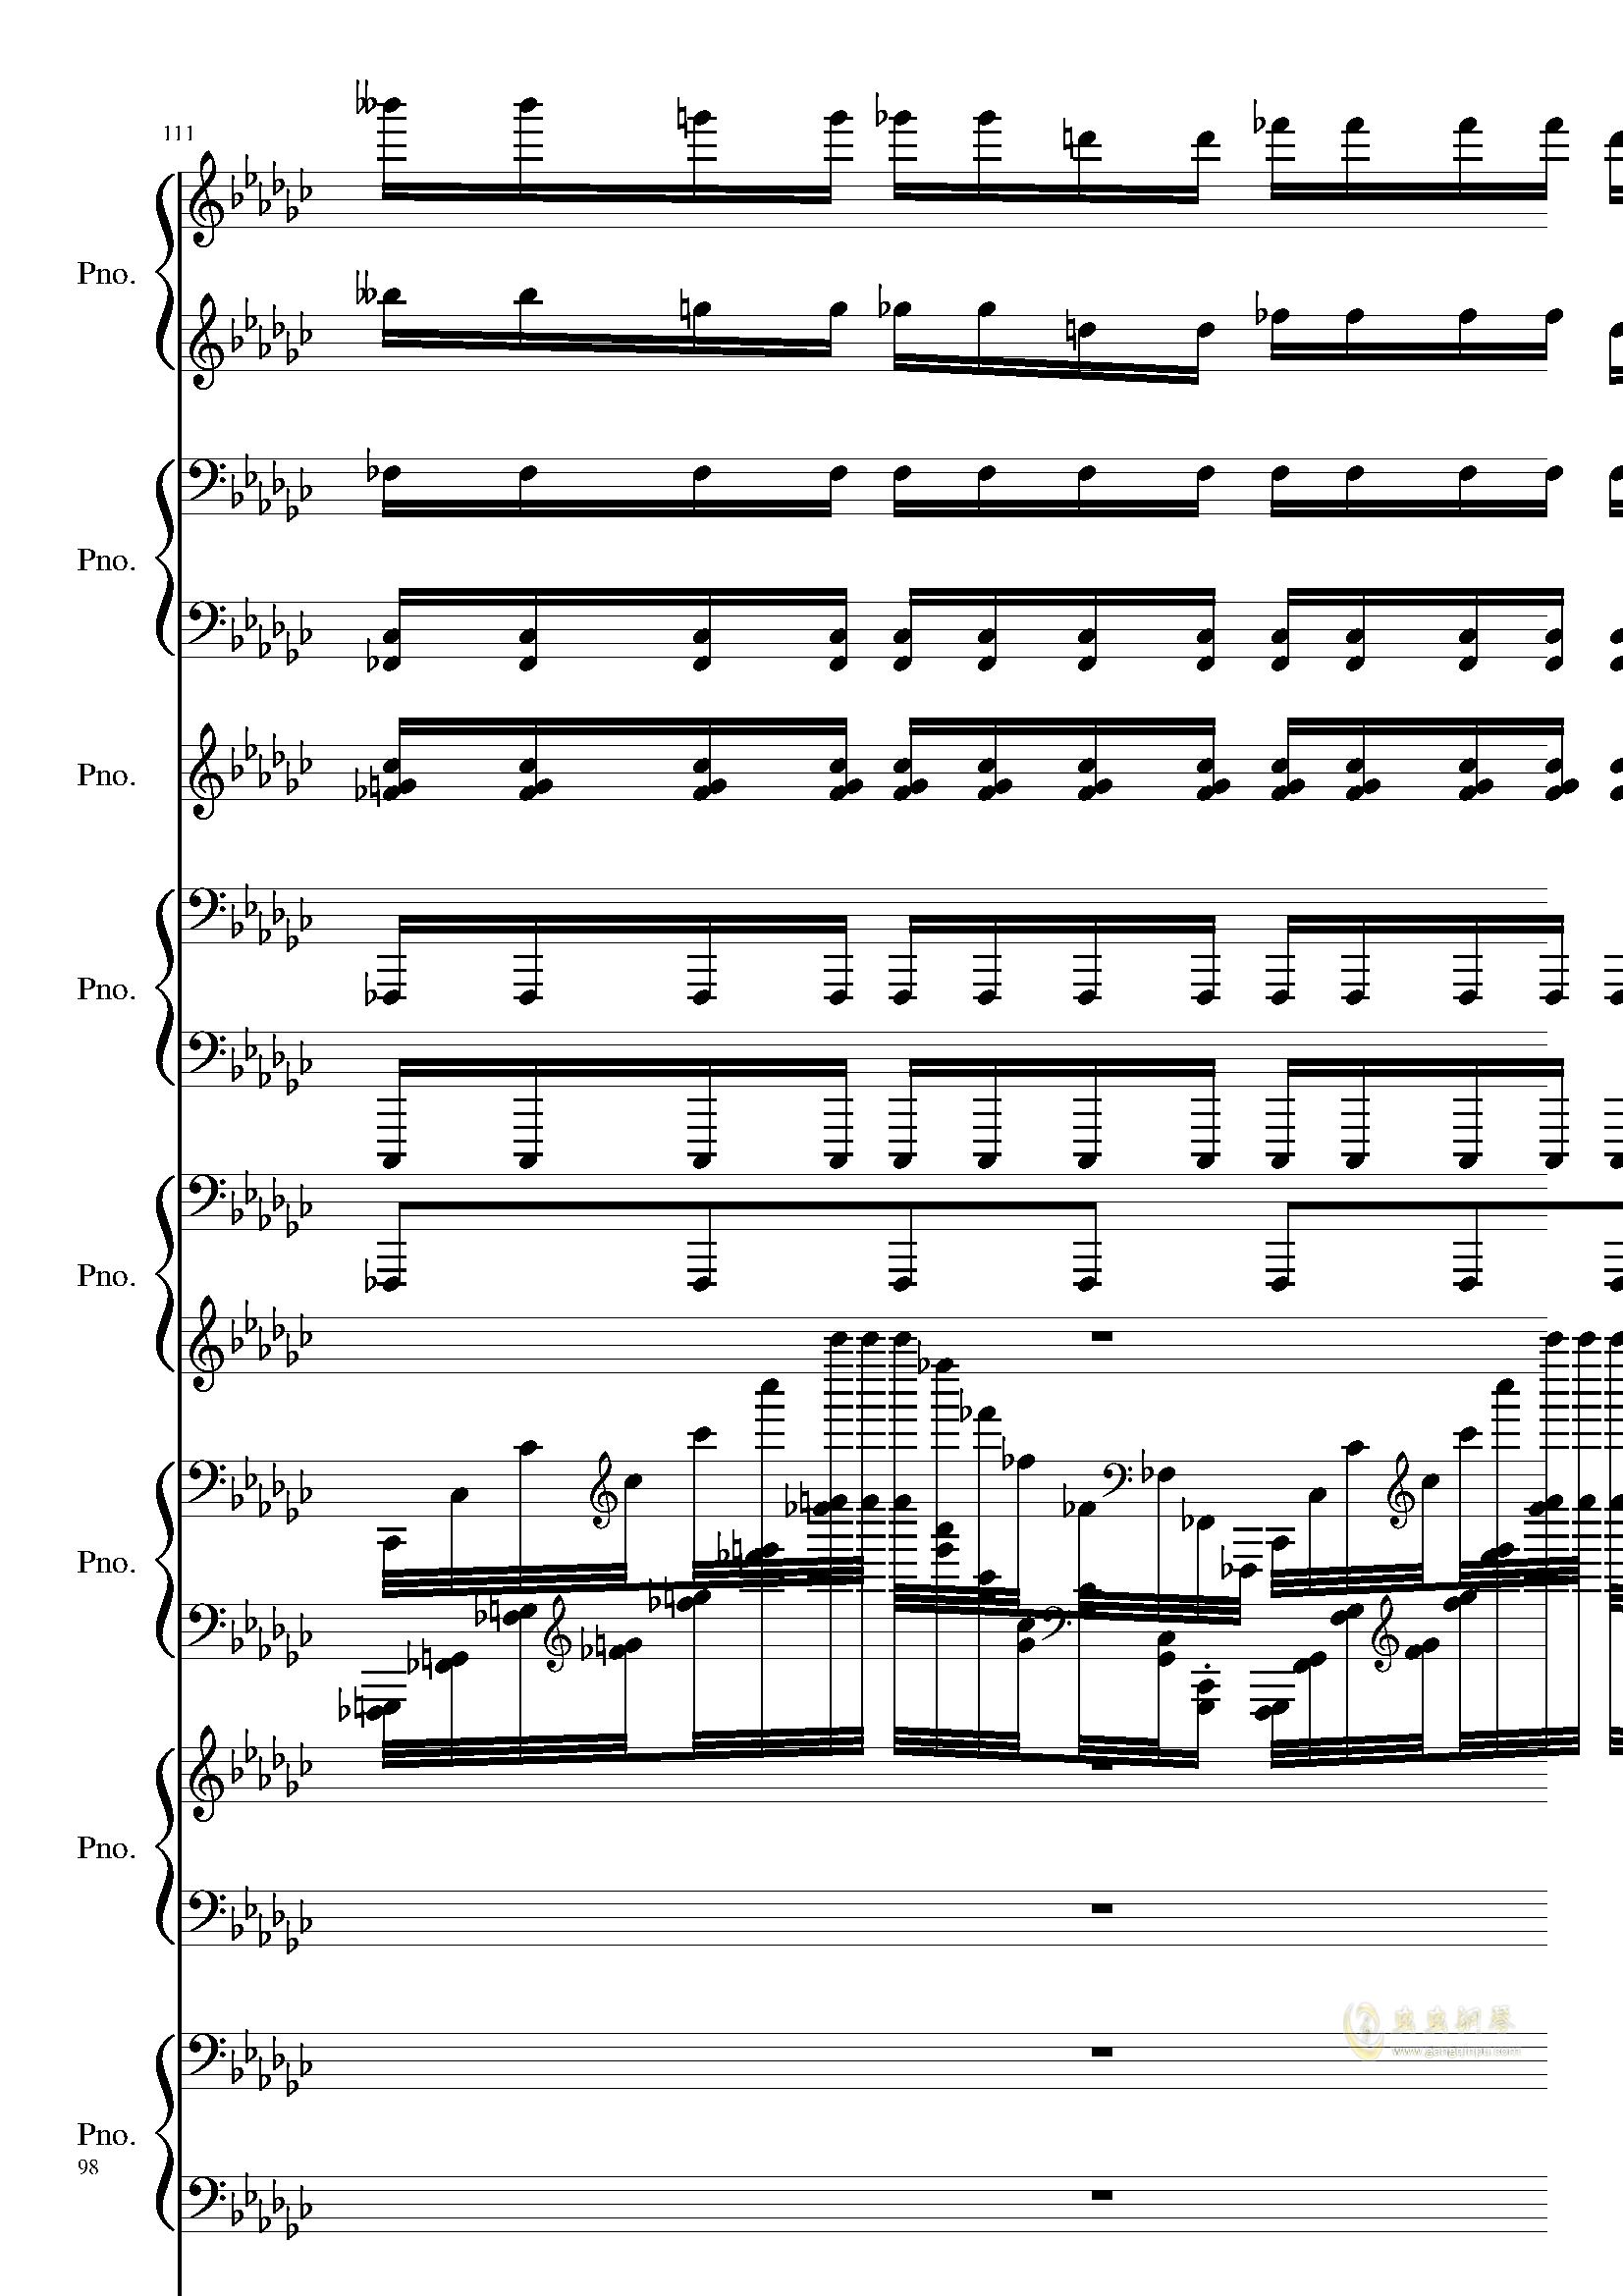 Bad Apple钢琴谱 第98页